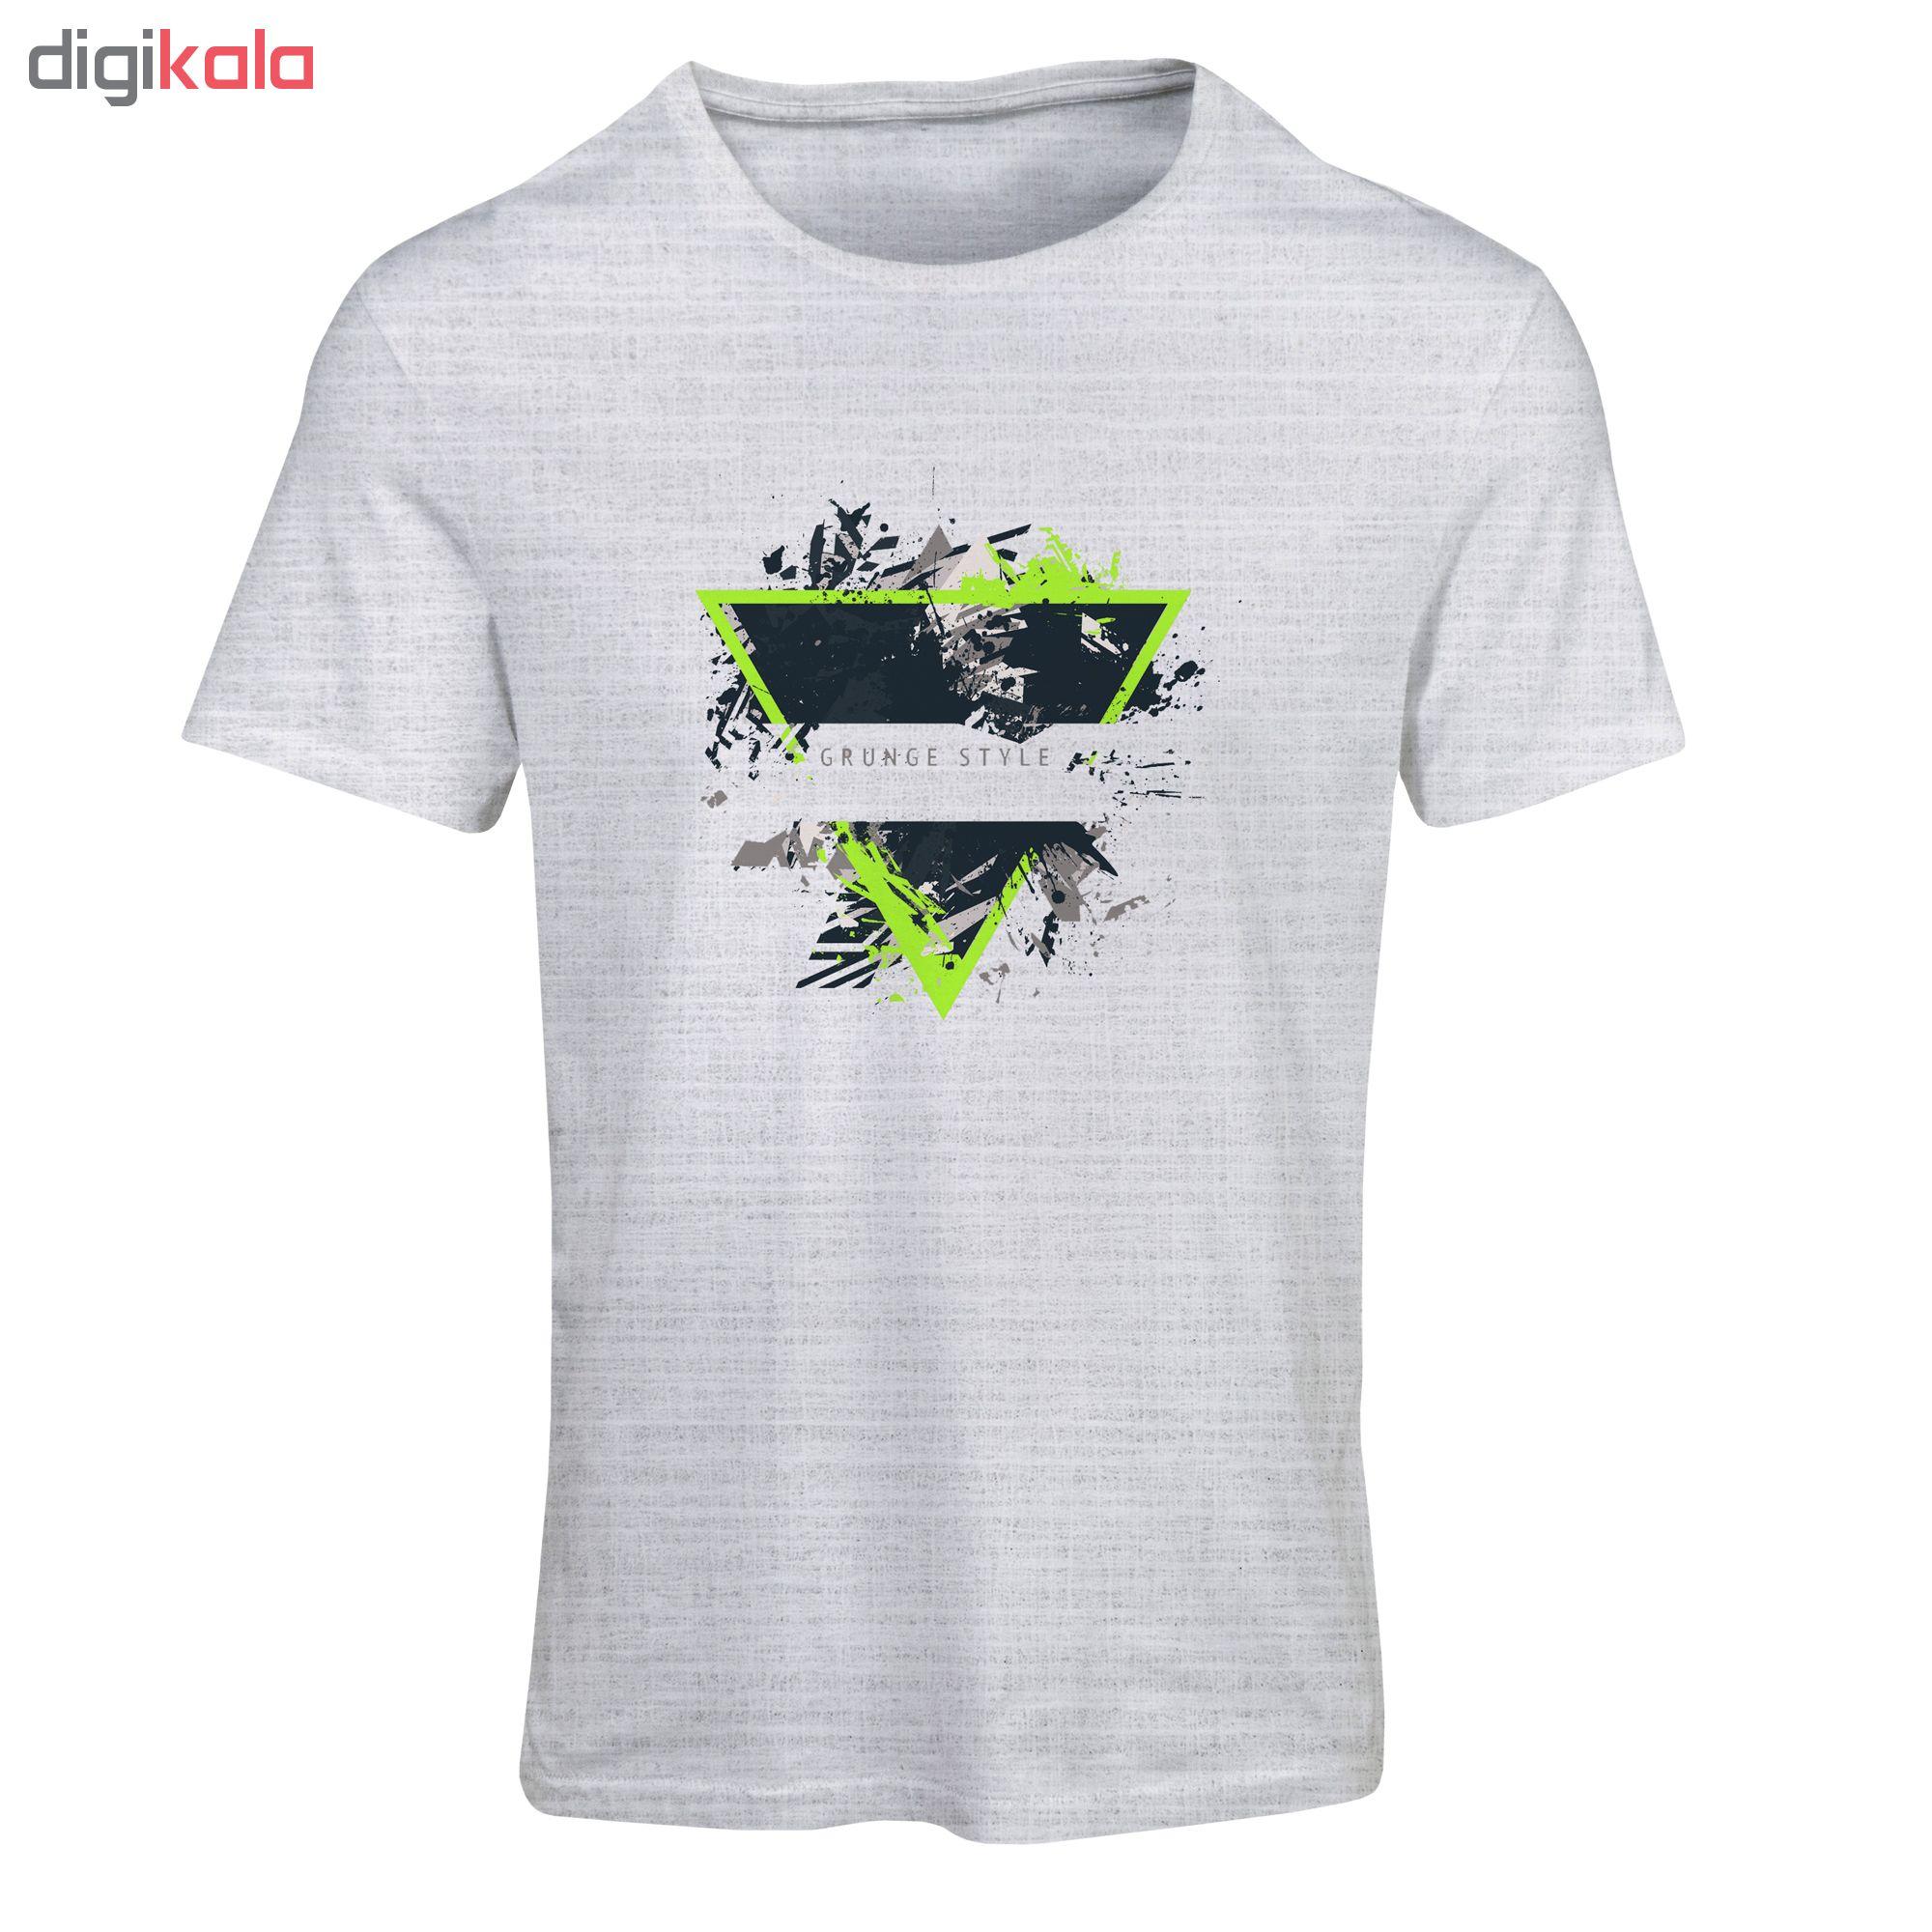 تیشرت آستین کوتاه مردانه طرح مثلث سبز کد SM174